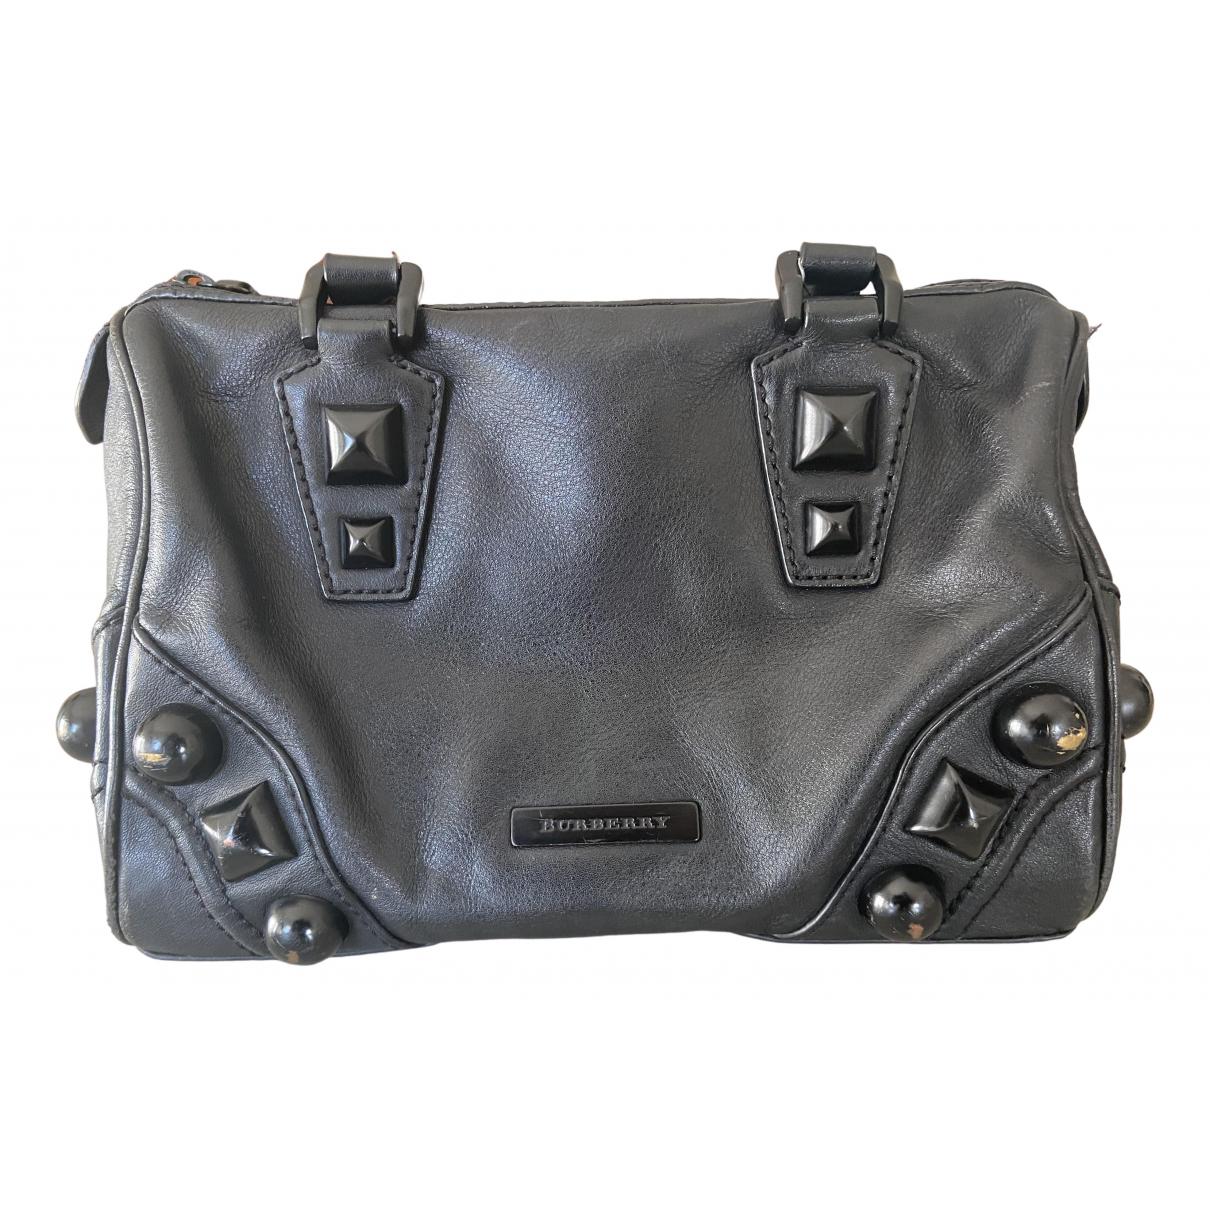 Burberry N Black Leather handbag for Women N